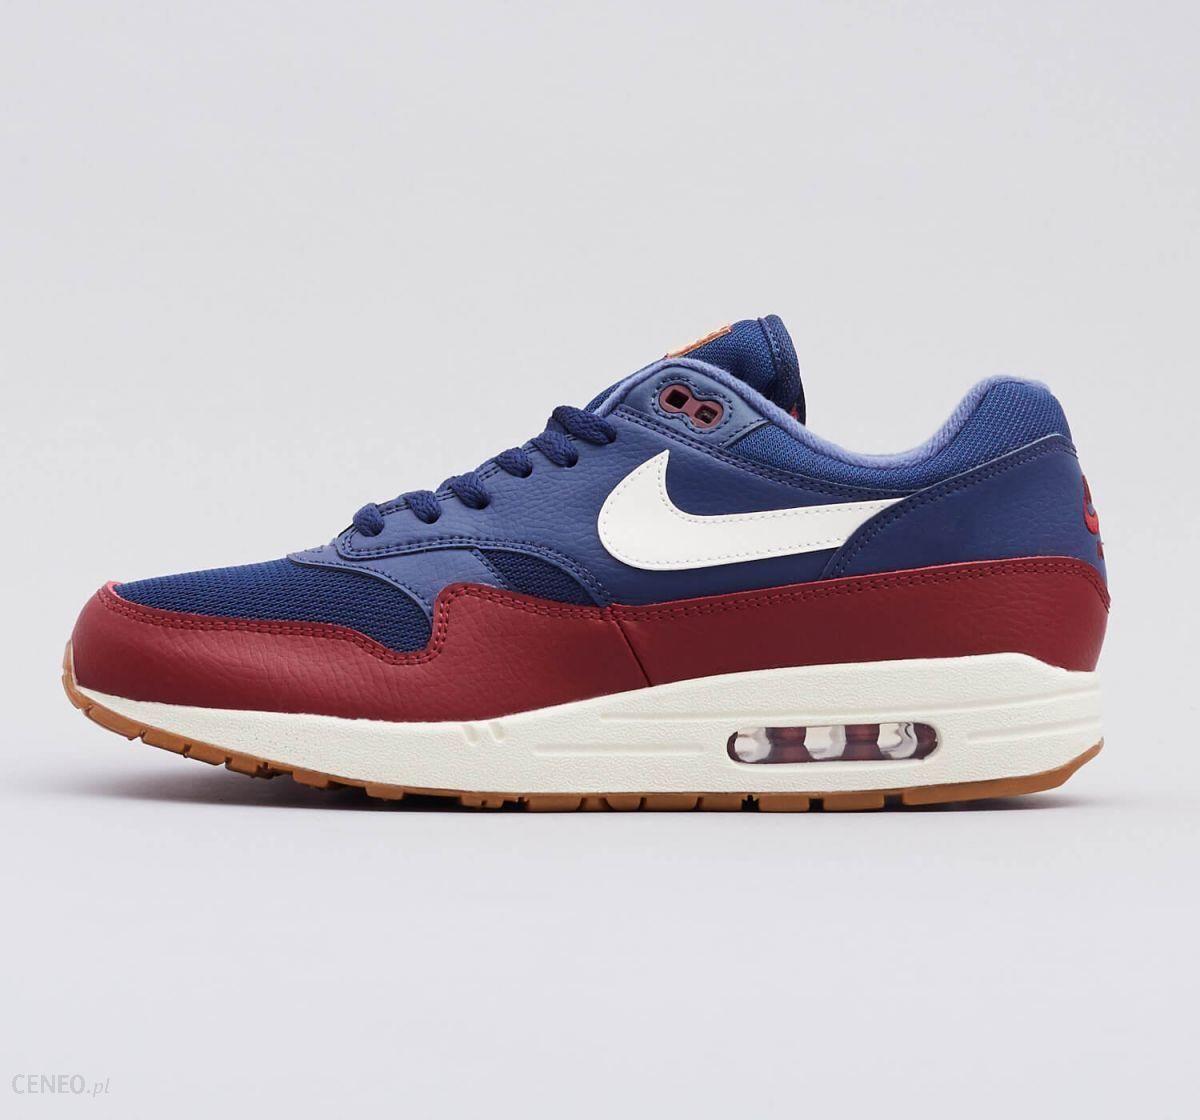 Nike AIR MAX 1 AH8145 400 Ceny i opinie Ceneo.pl